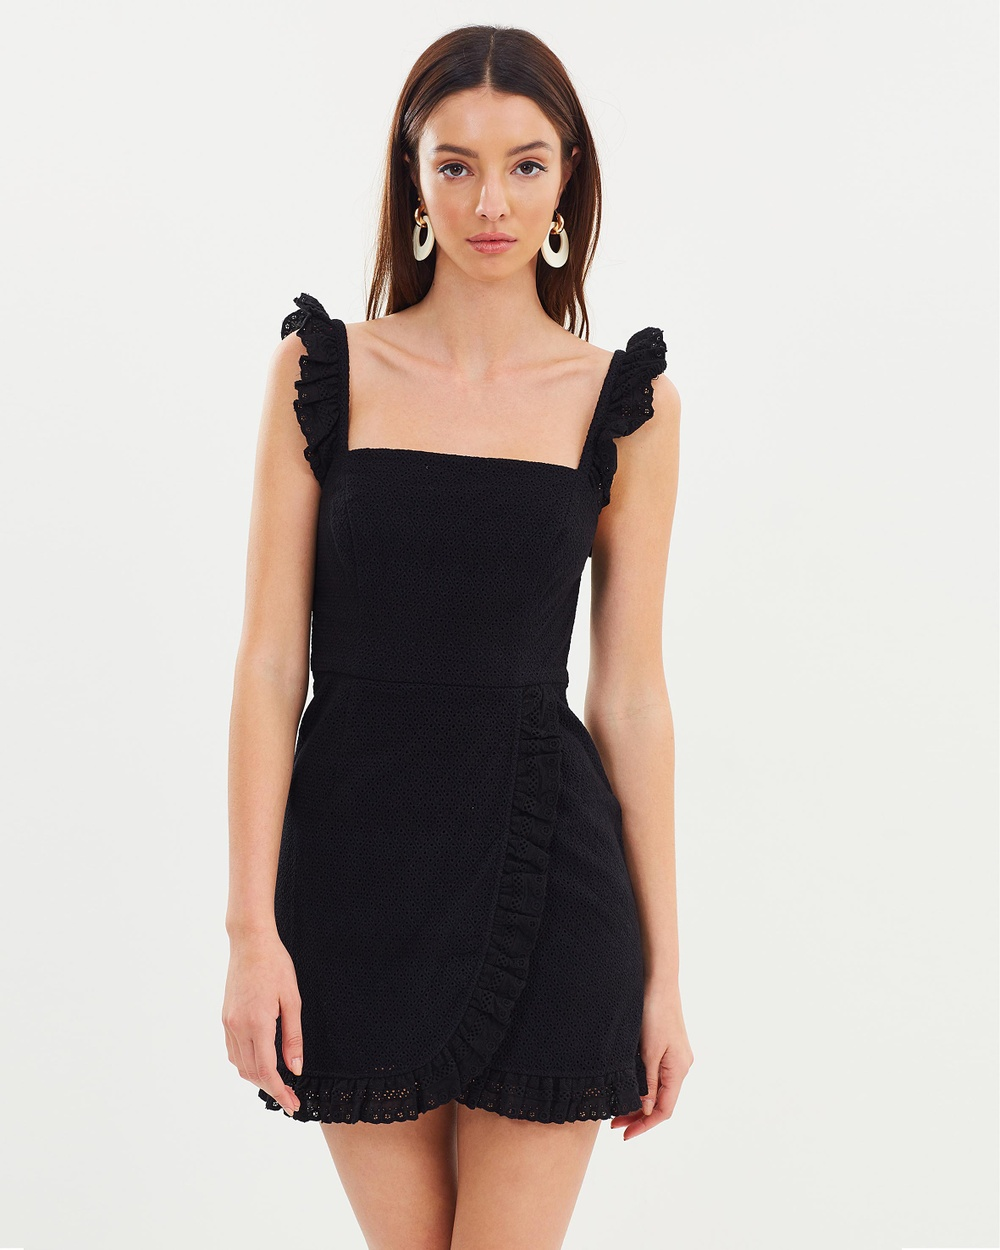 Shona Joy Fitted Mini Dress Bodycon Dresses Black Fitted Mini Dress